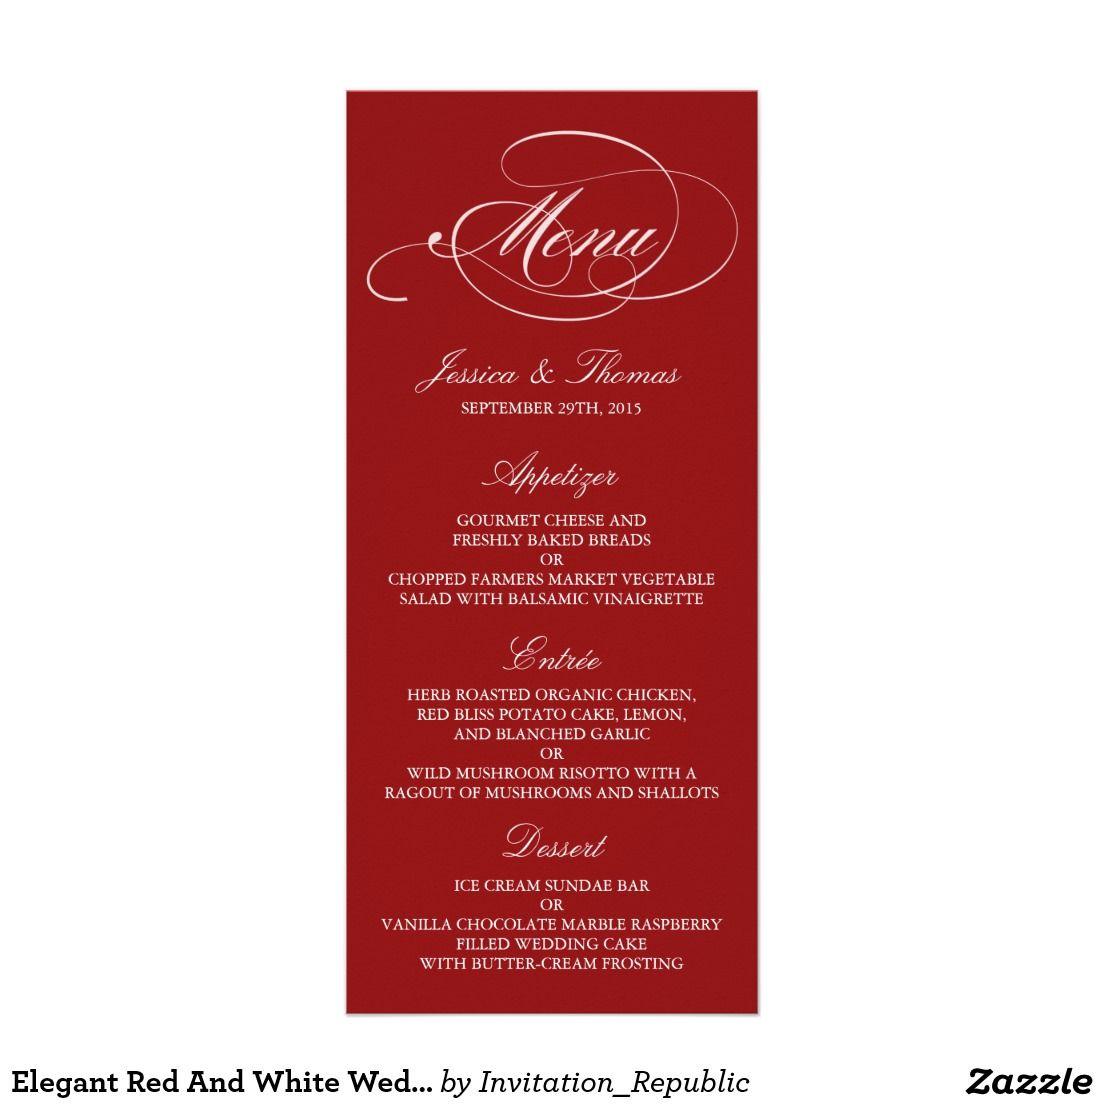 Elegant Red And White Wedding Menu Templates   Pinterest   Wedding ...